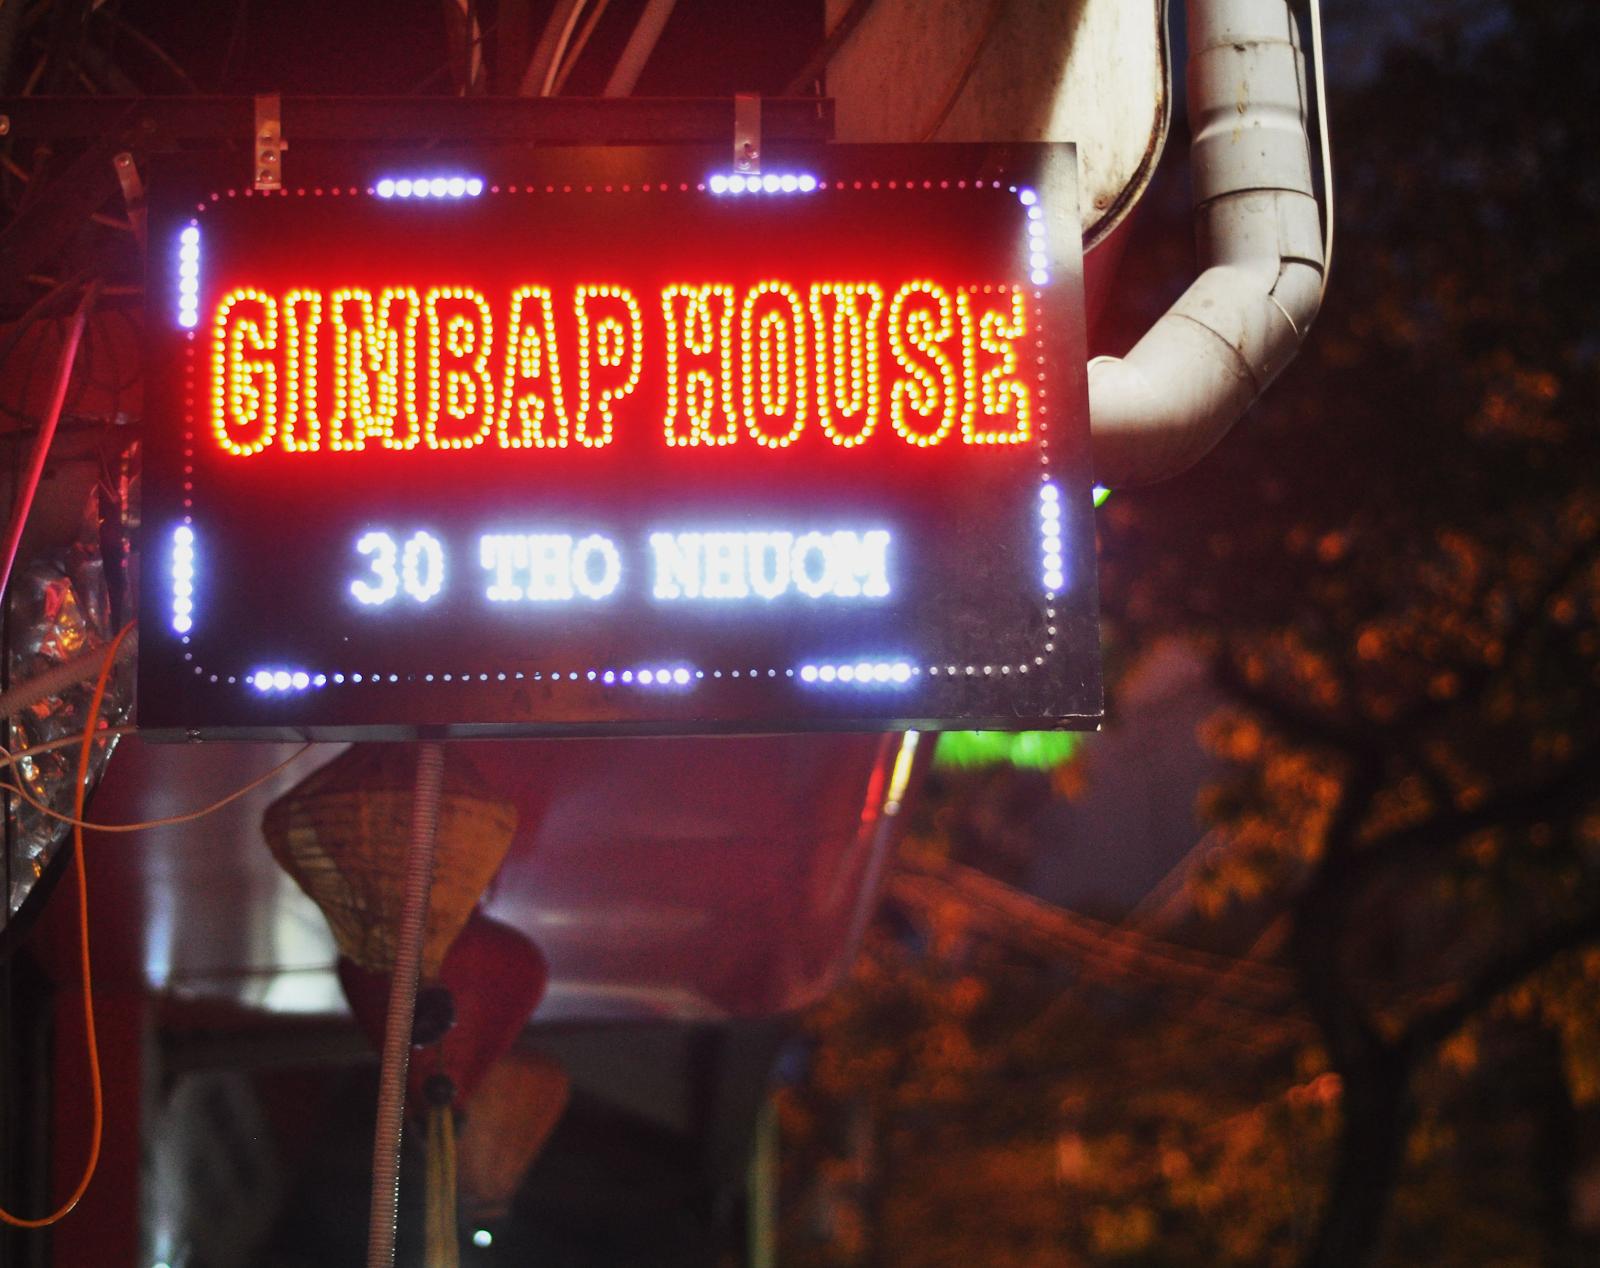 Gimbap House